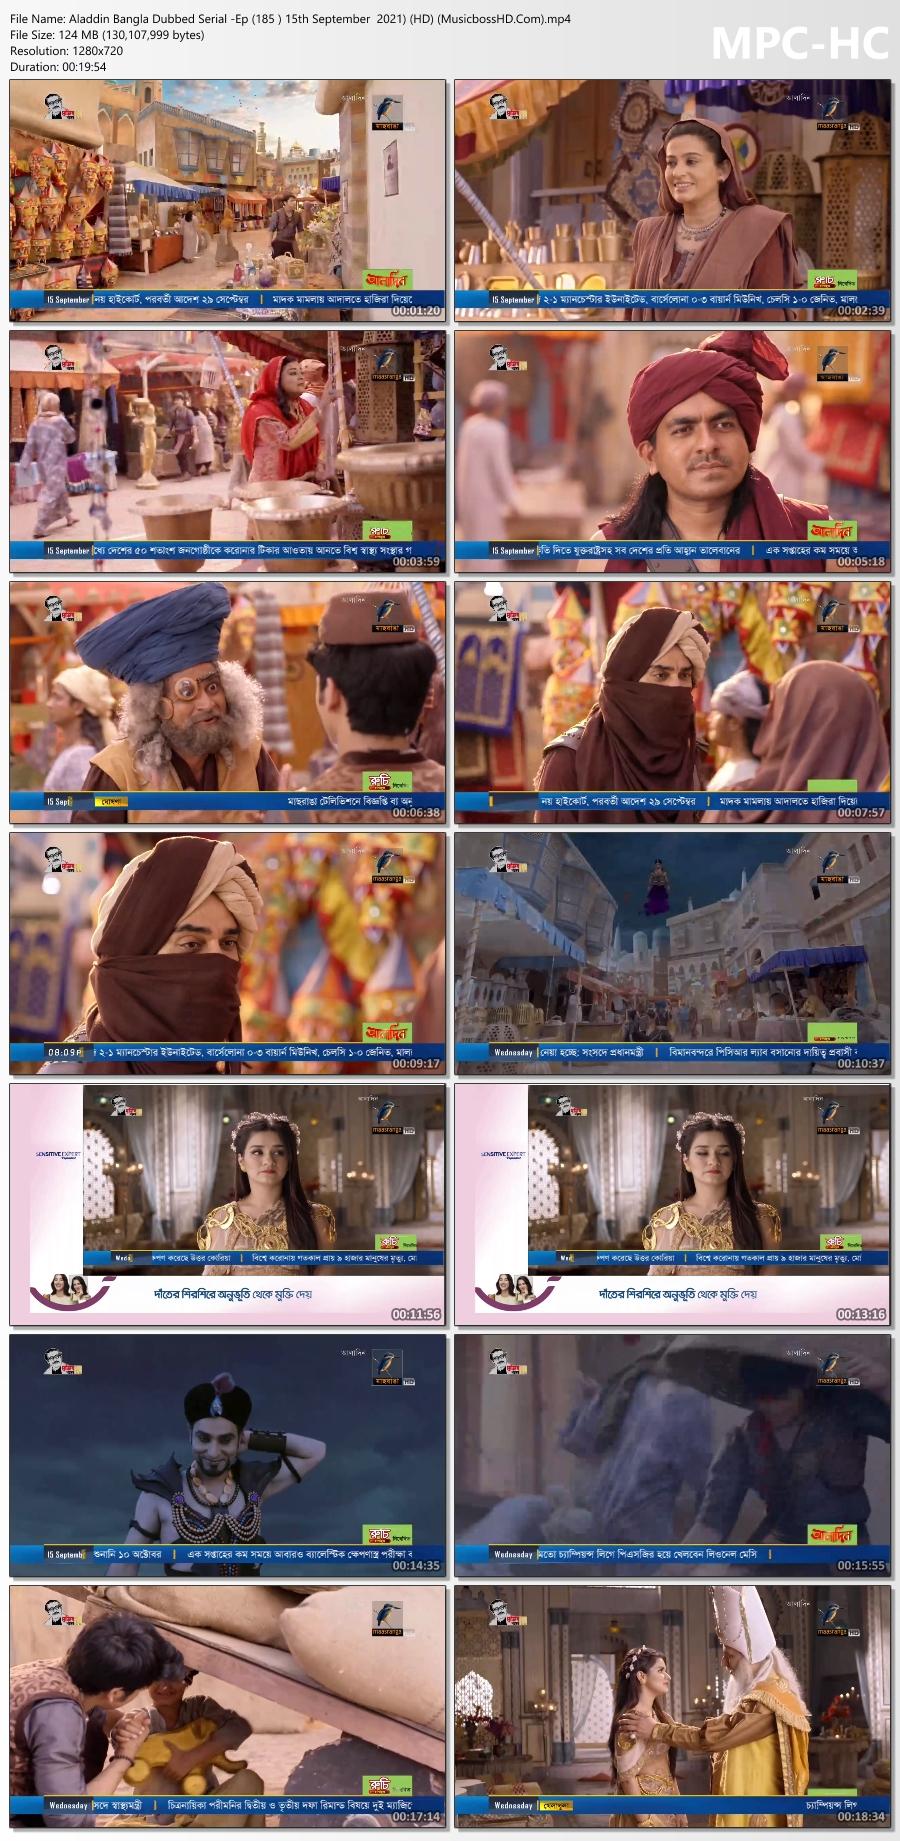 Aladdin-Bangla-Dubbed-Serial-Ep-185-15th-September-2021-HD-Musicboss-HD-Com-mp4-thumbs